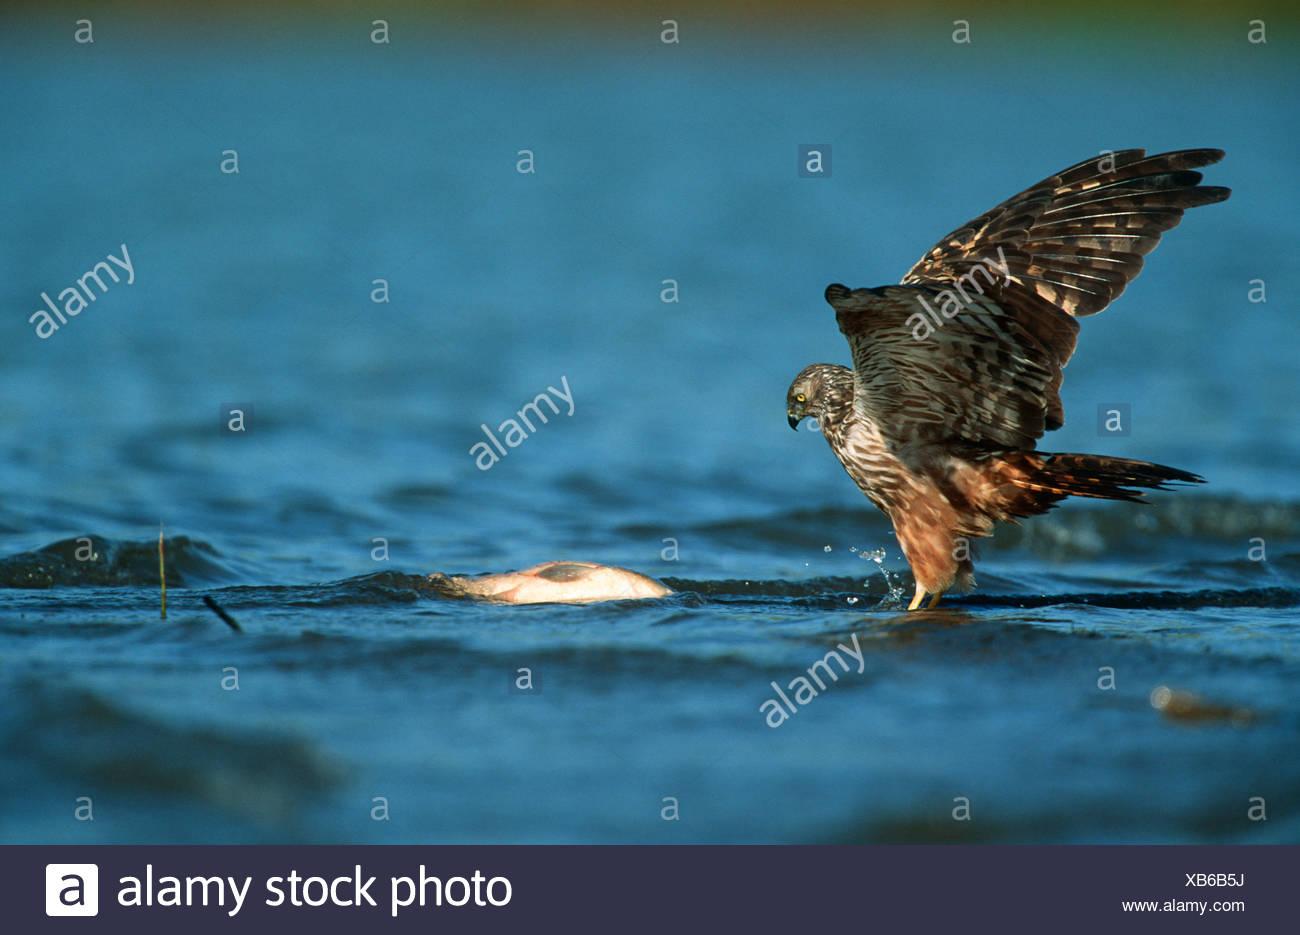 African Marsh-Harrier (Circus ranivorus) Hunting in Water - Stock Image